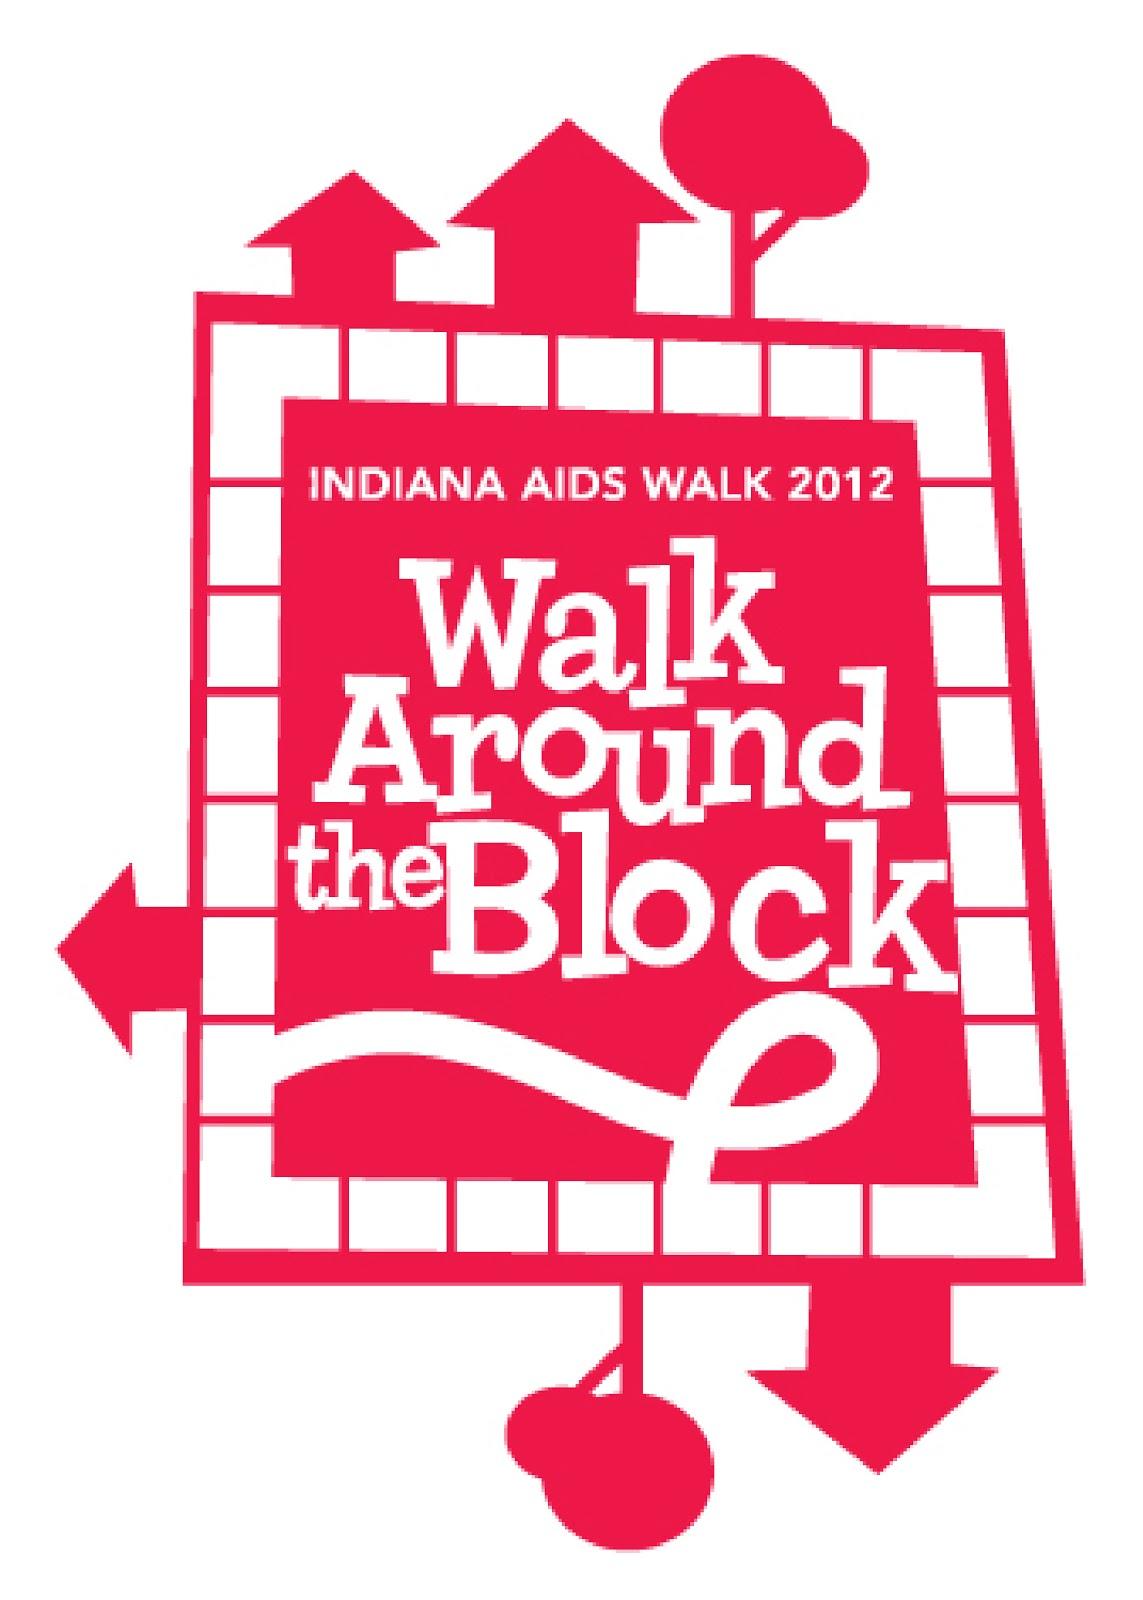 Walk around the block with us.